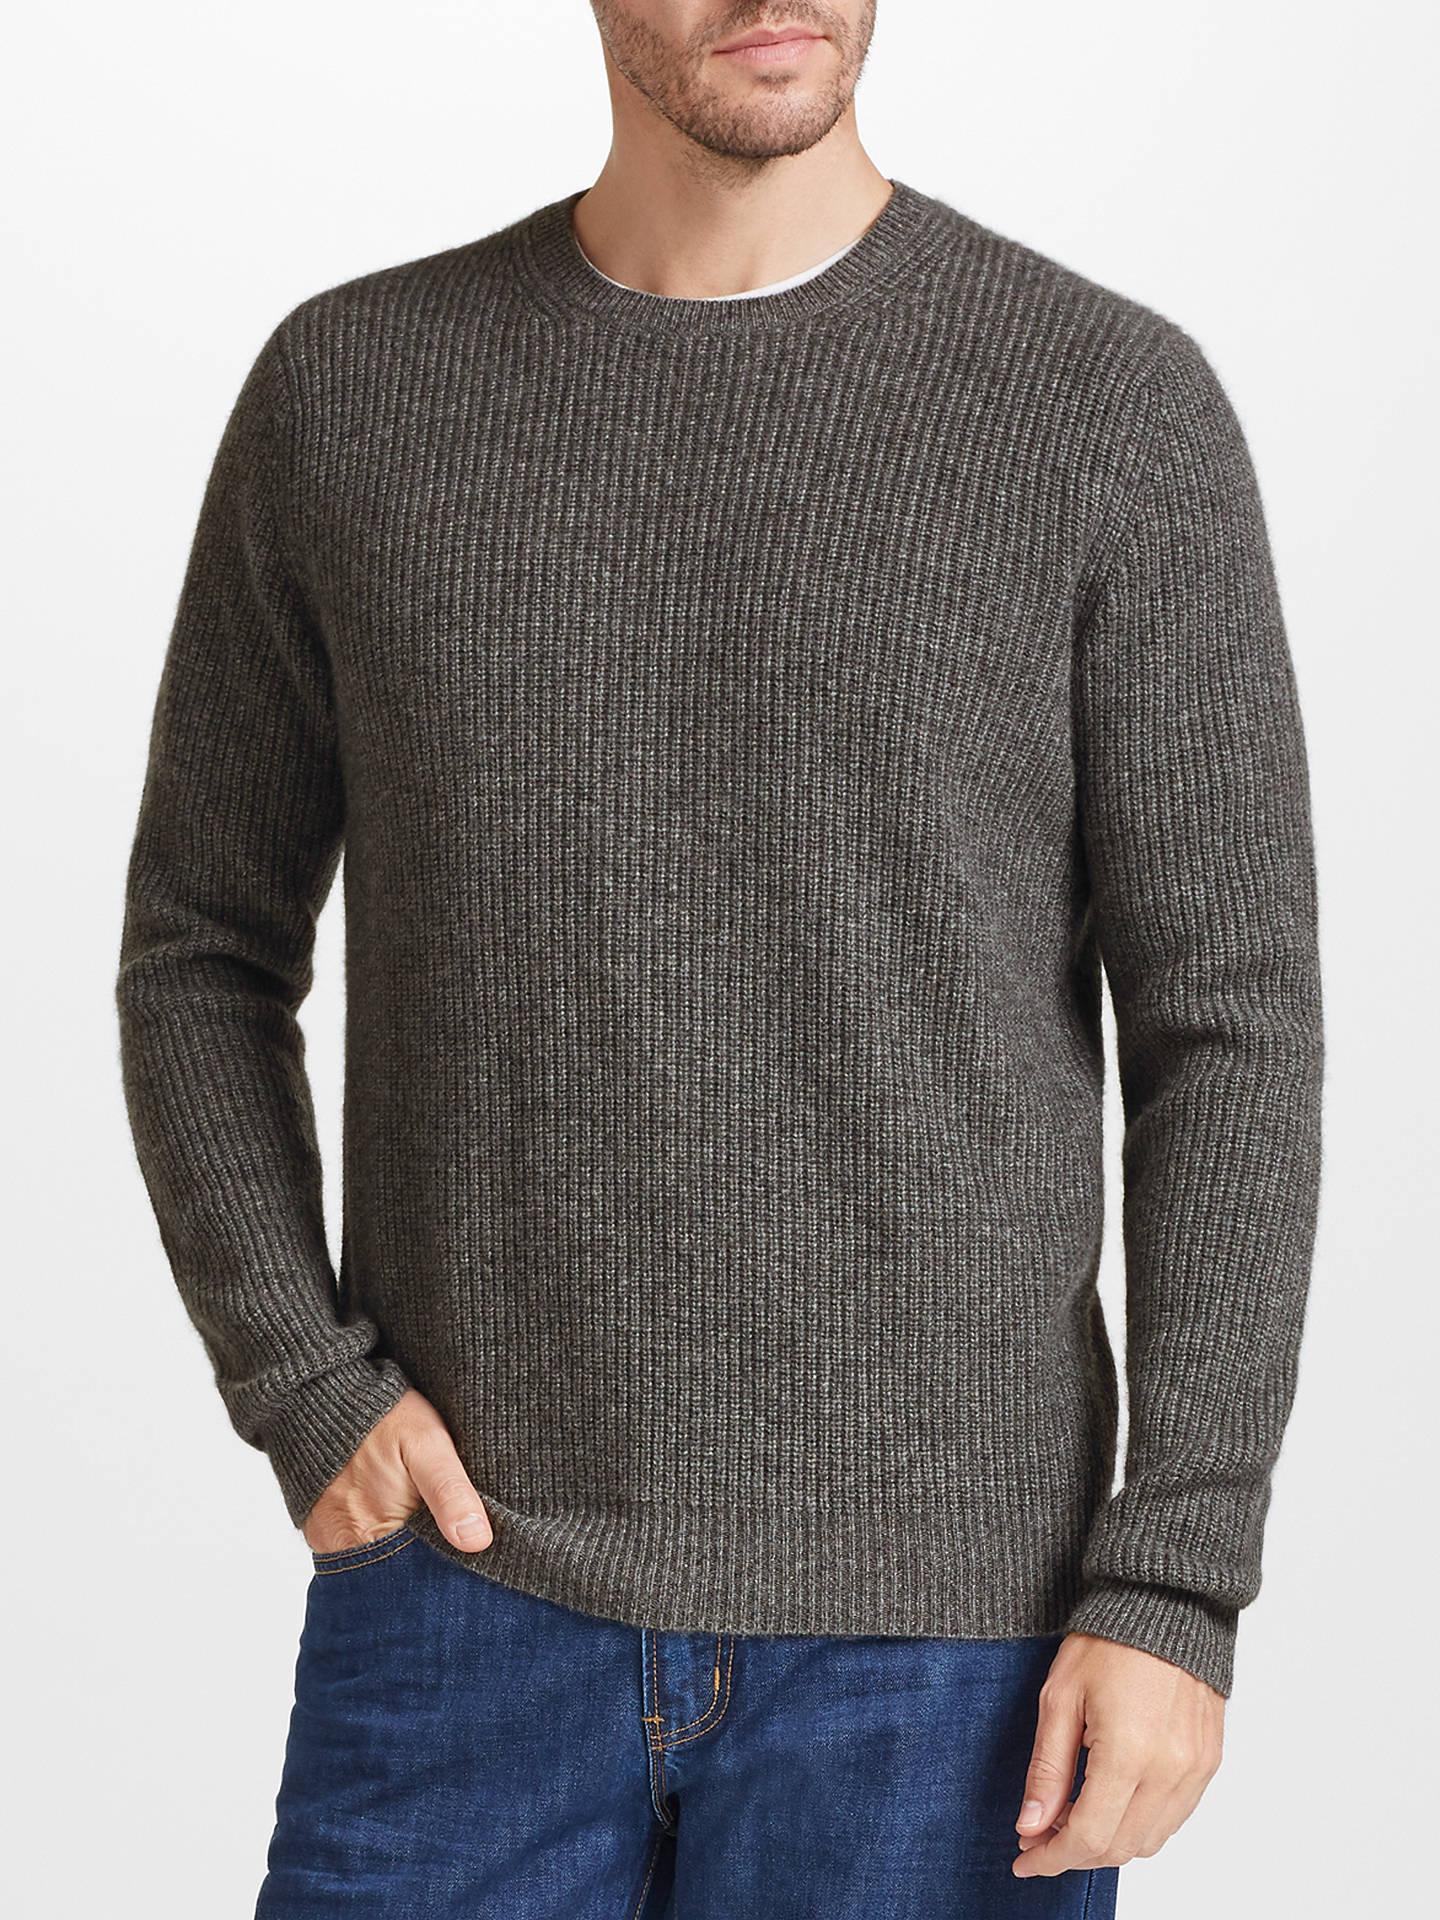 2a57bab6598f John Lewis Premium Cashmere Knit Jumper at John Lewis   Partners